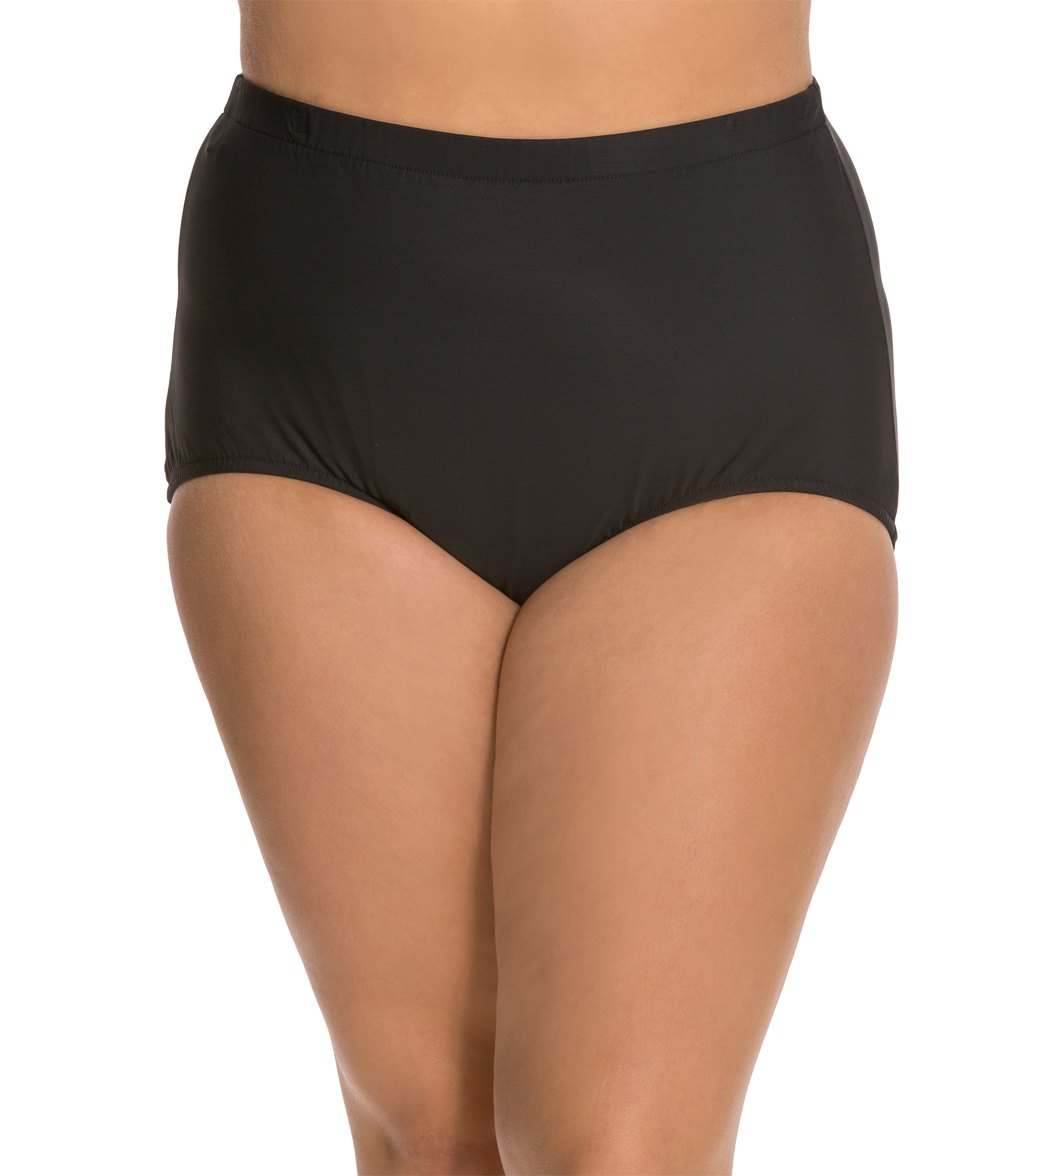 cc66e749dbbdd Penbrooke Plus Size Solid Girl Leg Bottom at SwimOutlet.com